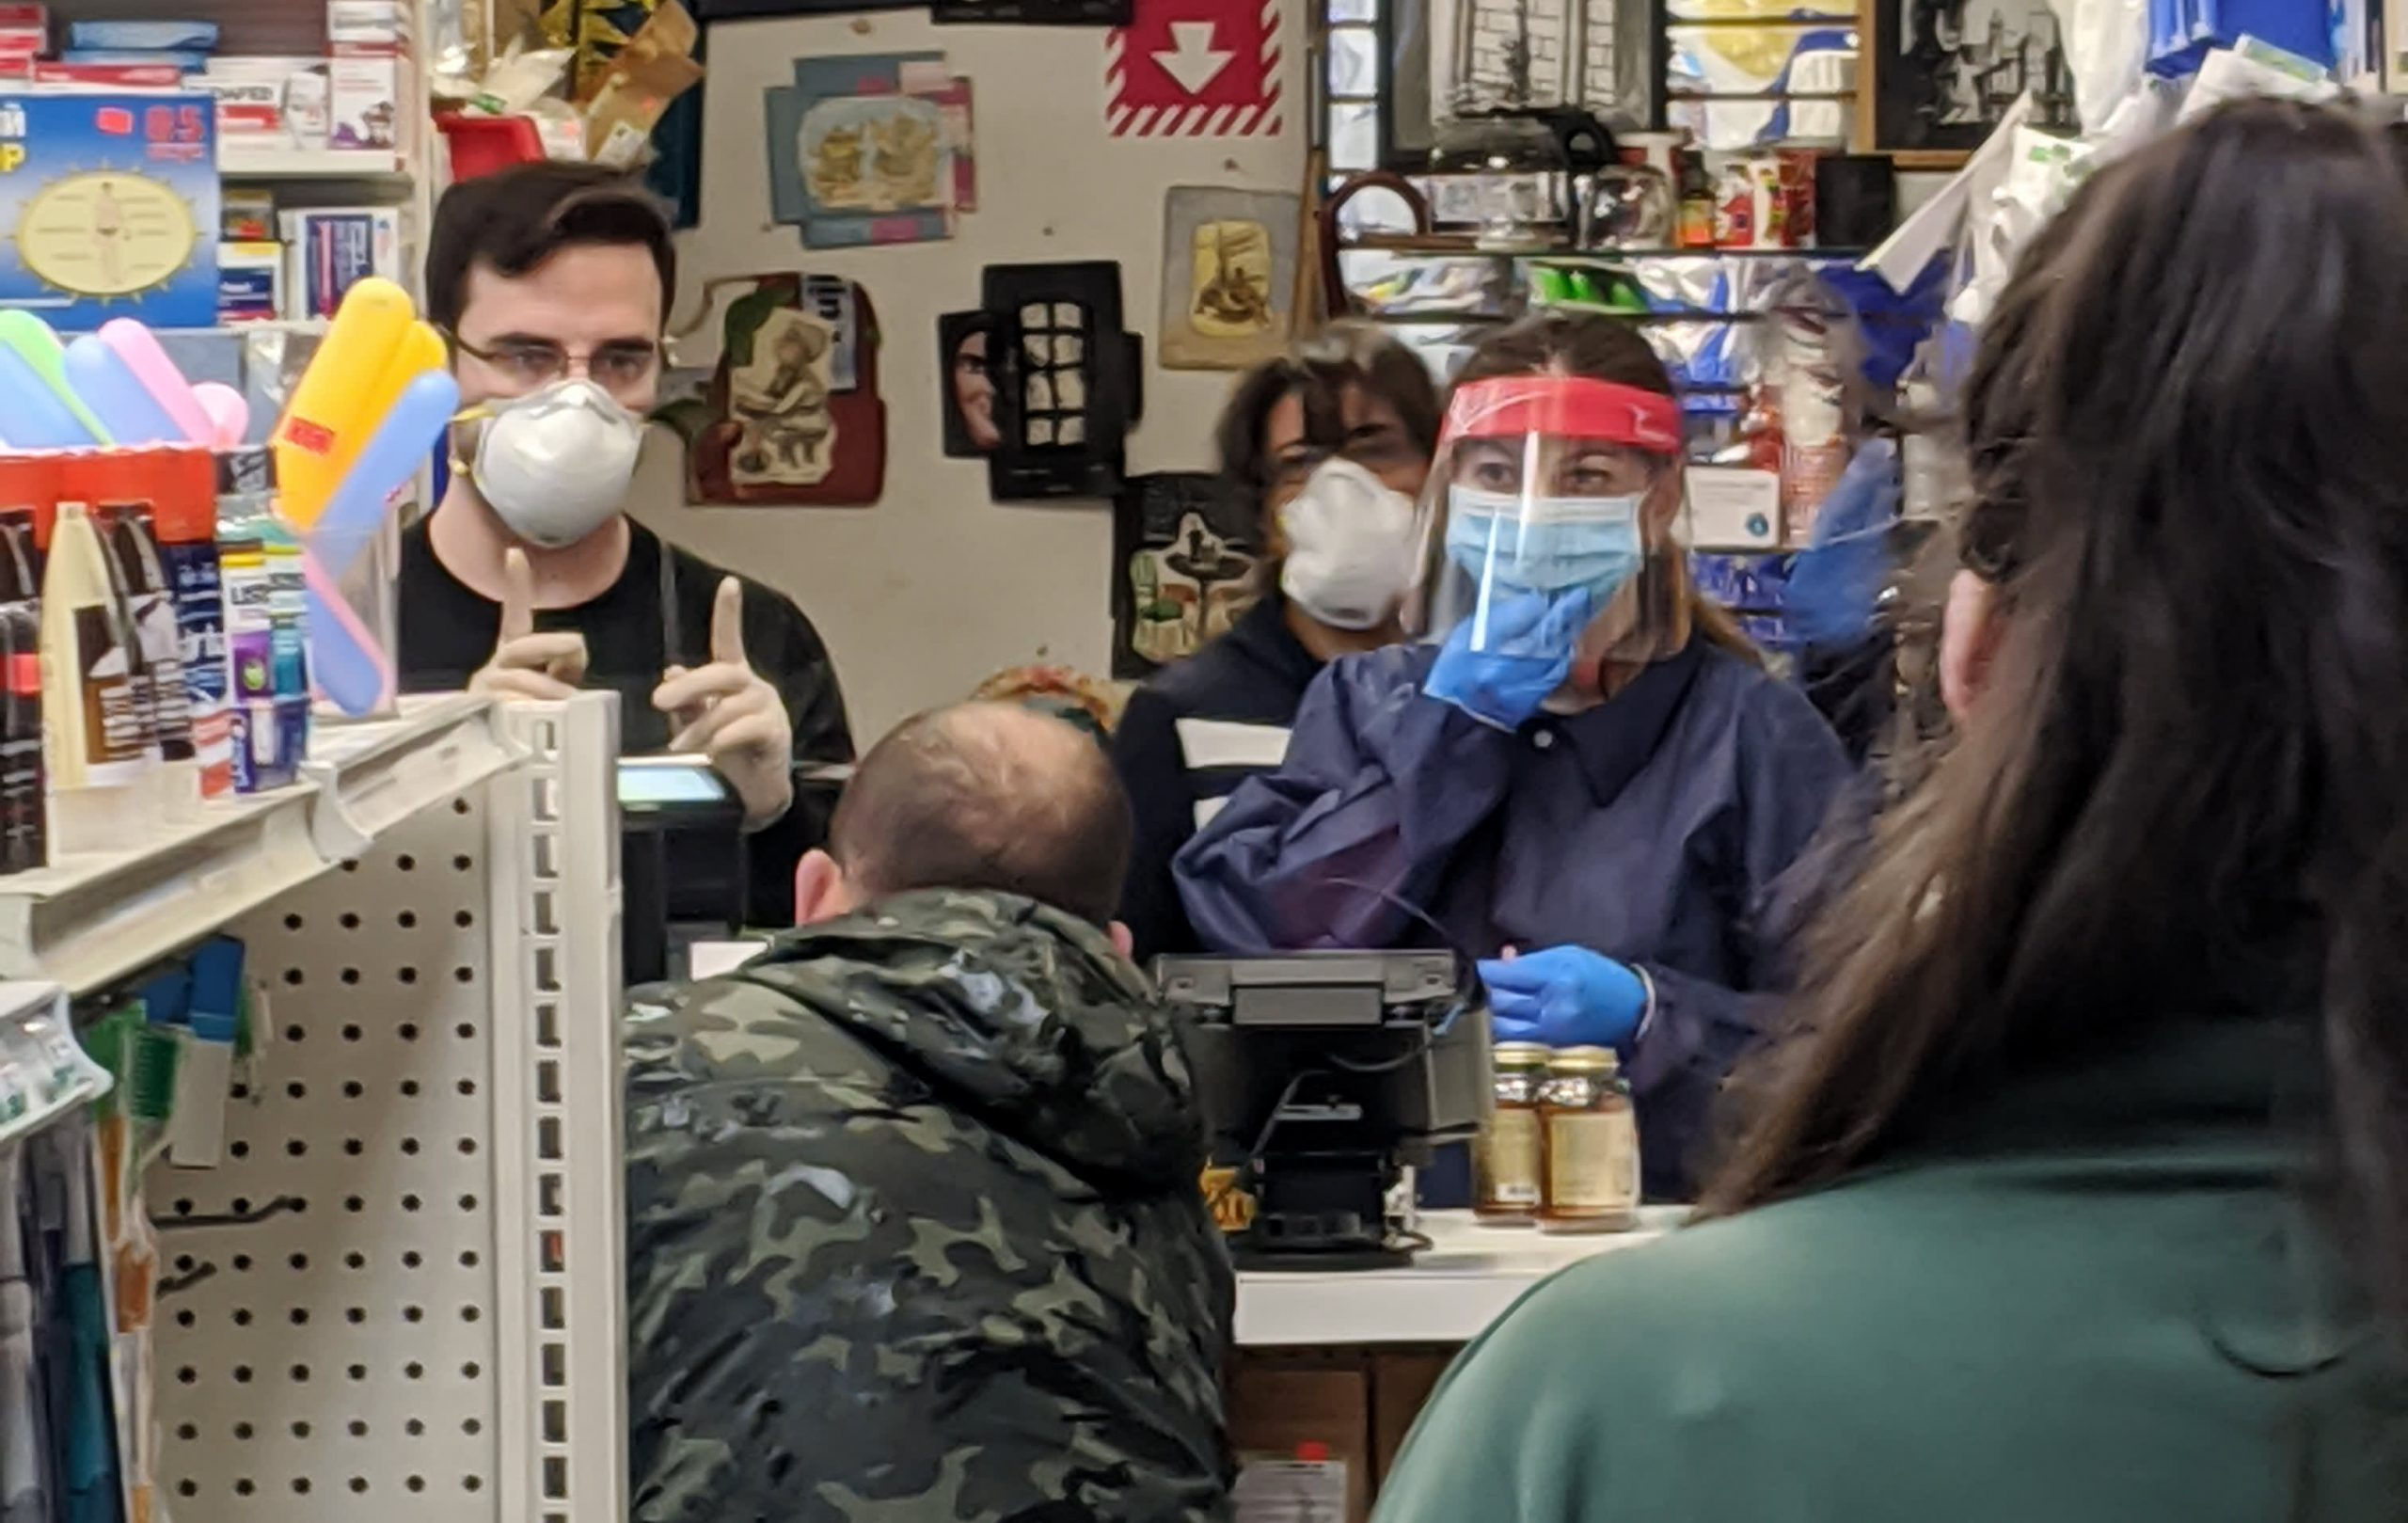 Coronavirus: Pharmacies struggle to meet demand amid supply shortages